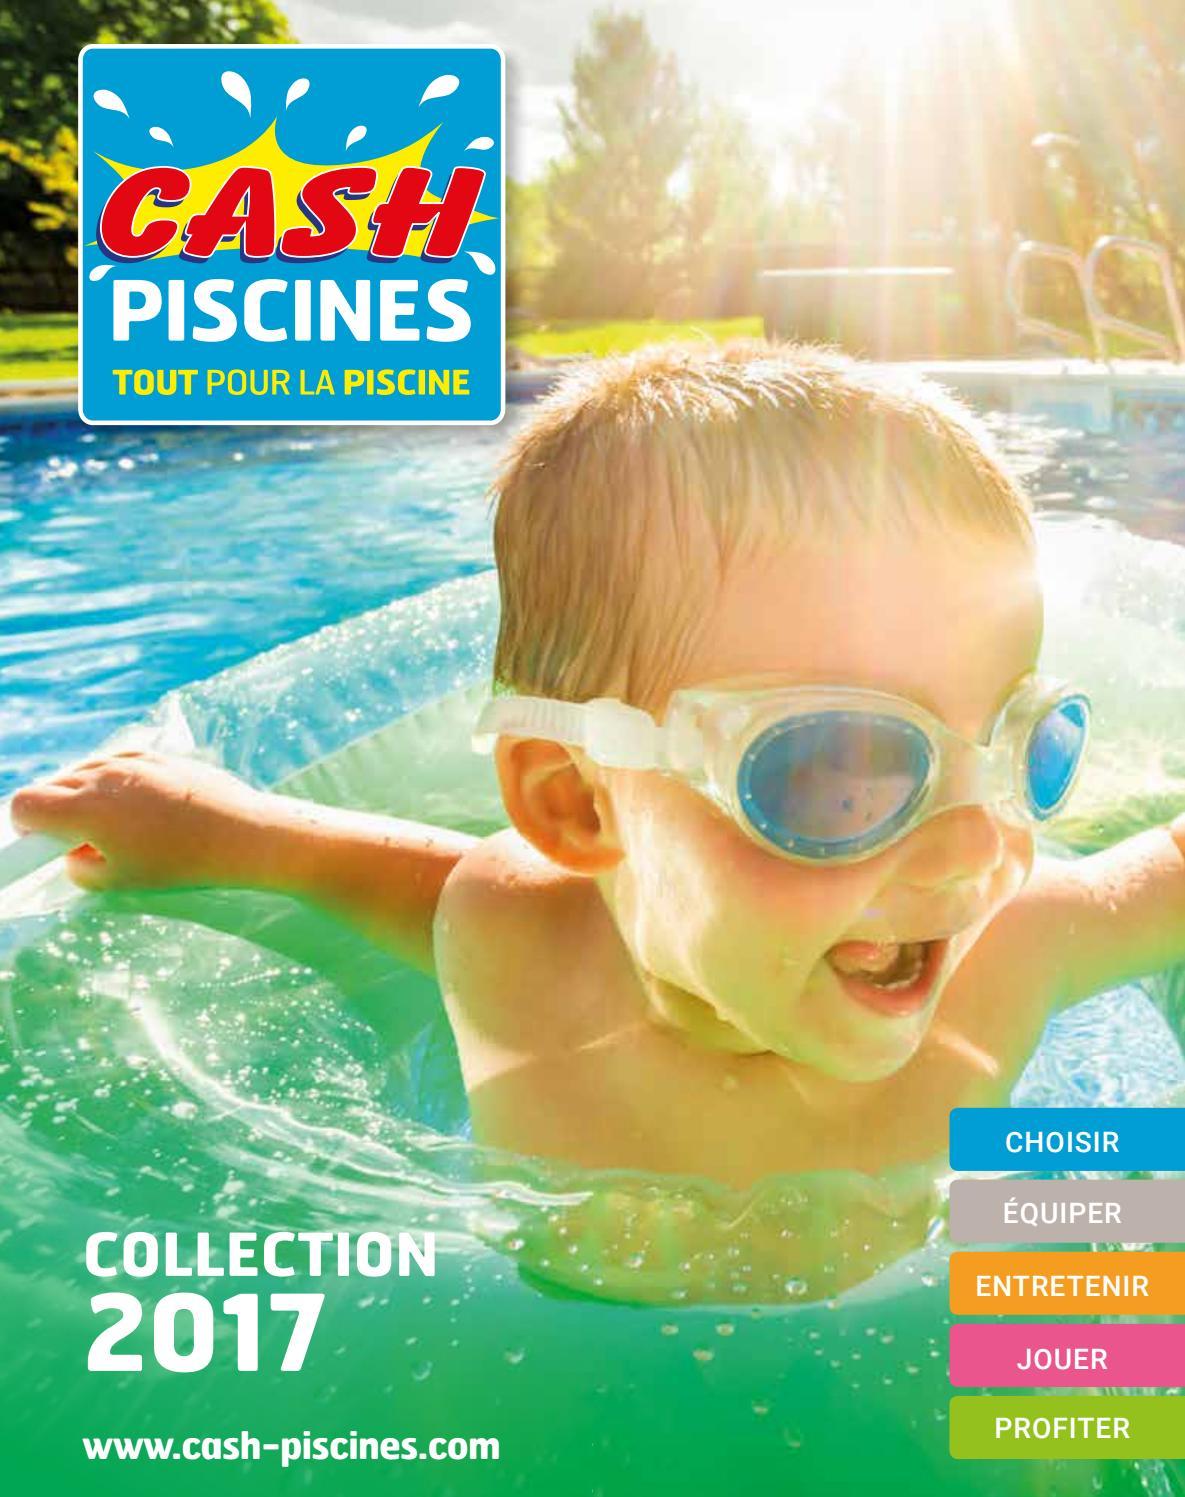 Catalogue Cash Piscine 2017 By Octave Octave - Issuu serapportantà Cash Piscine Beziers